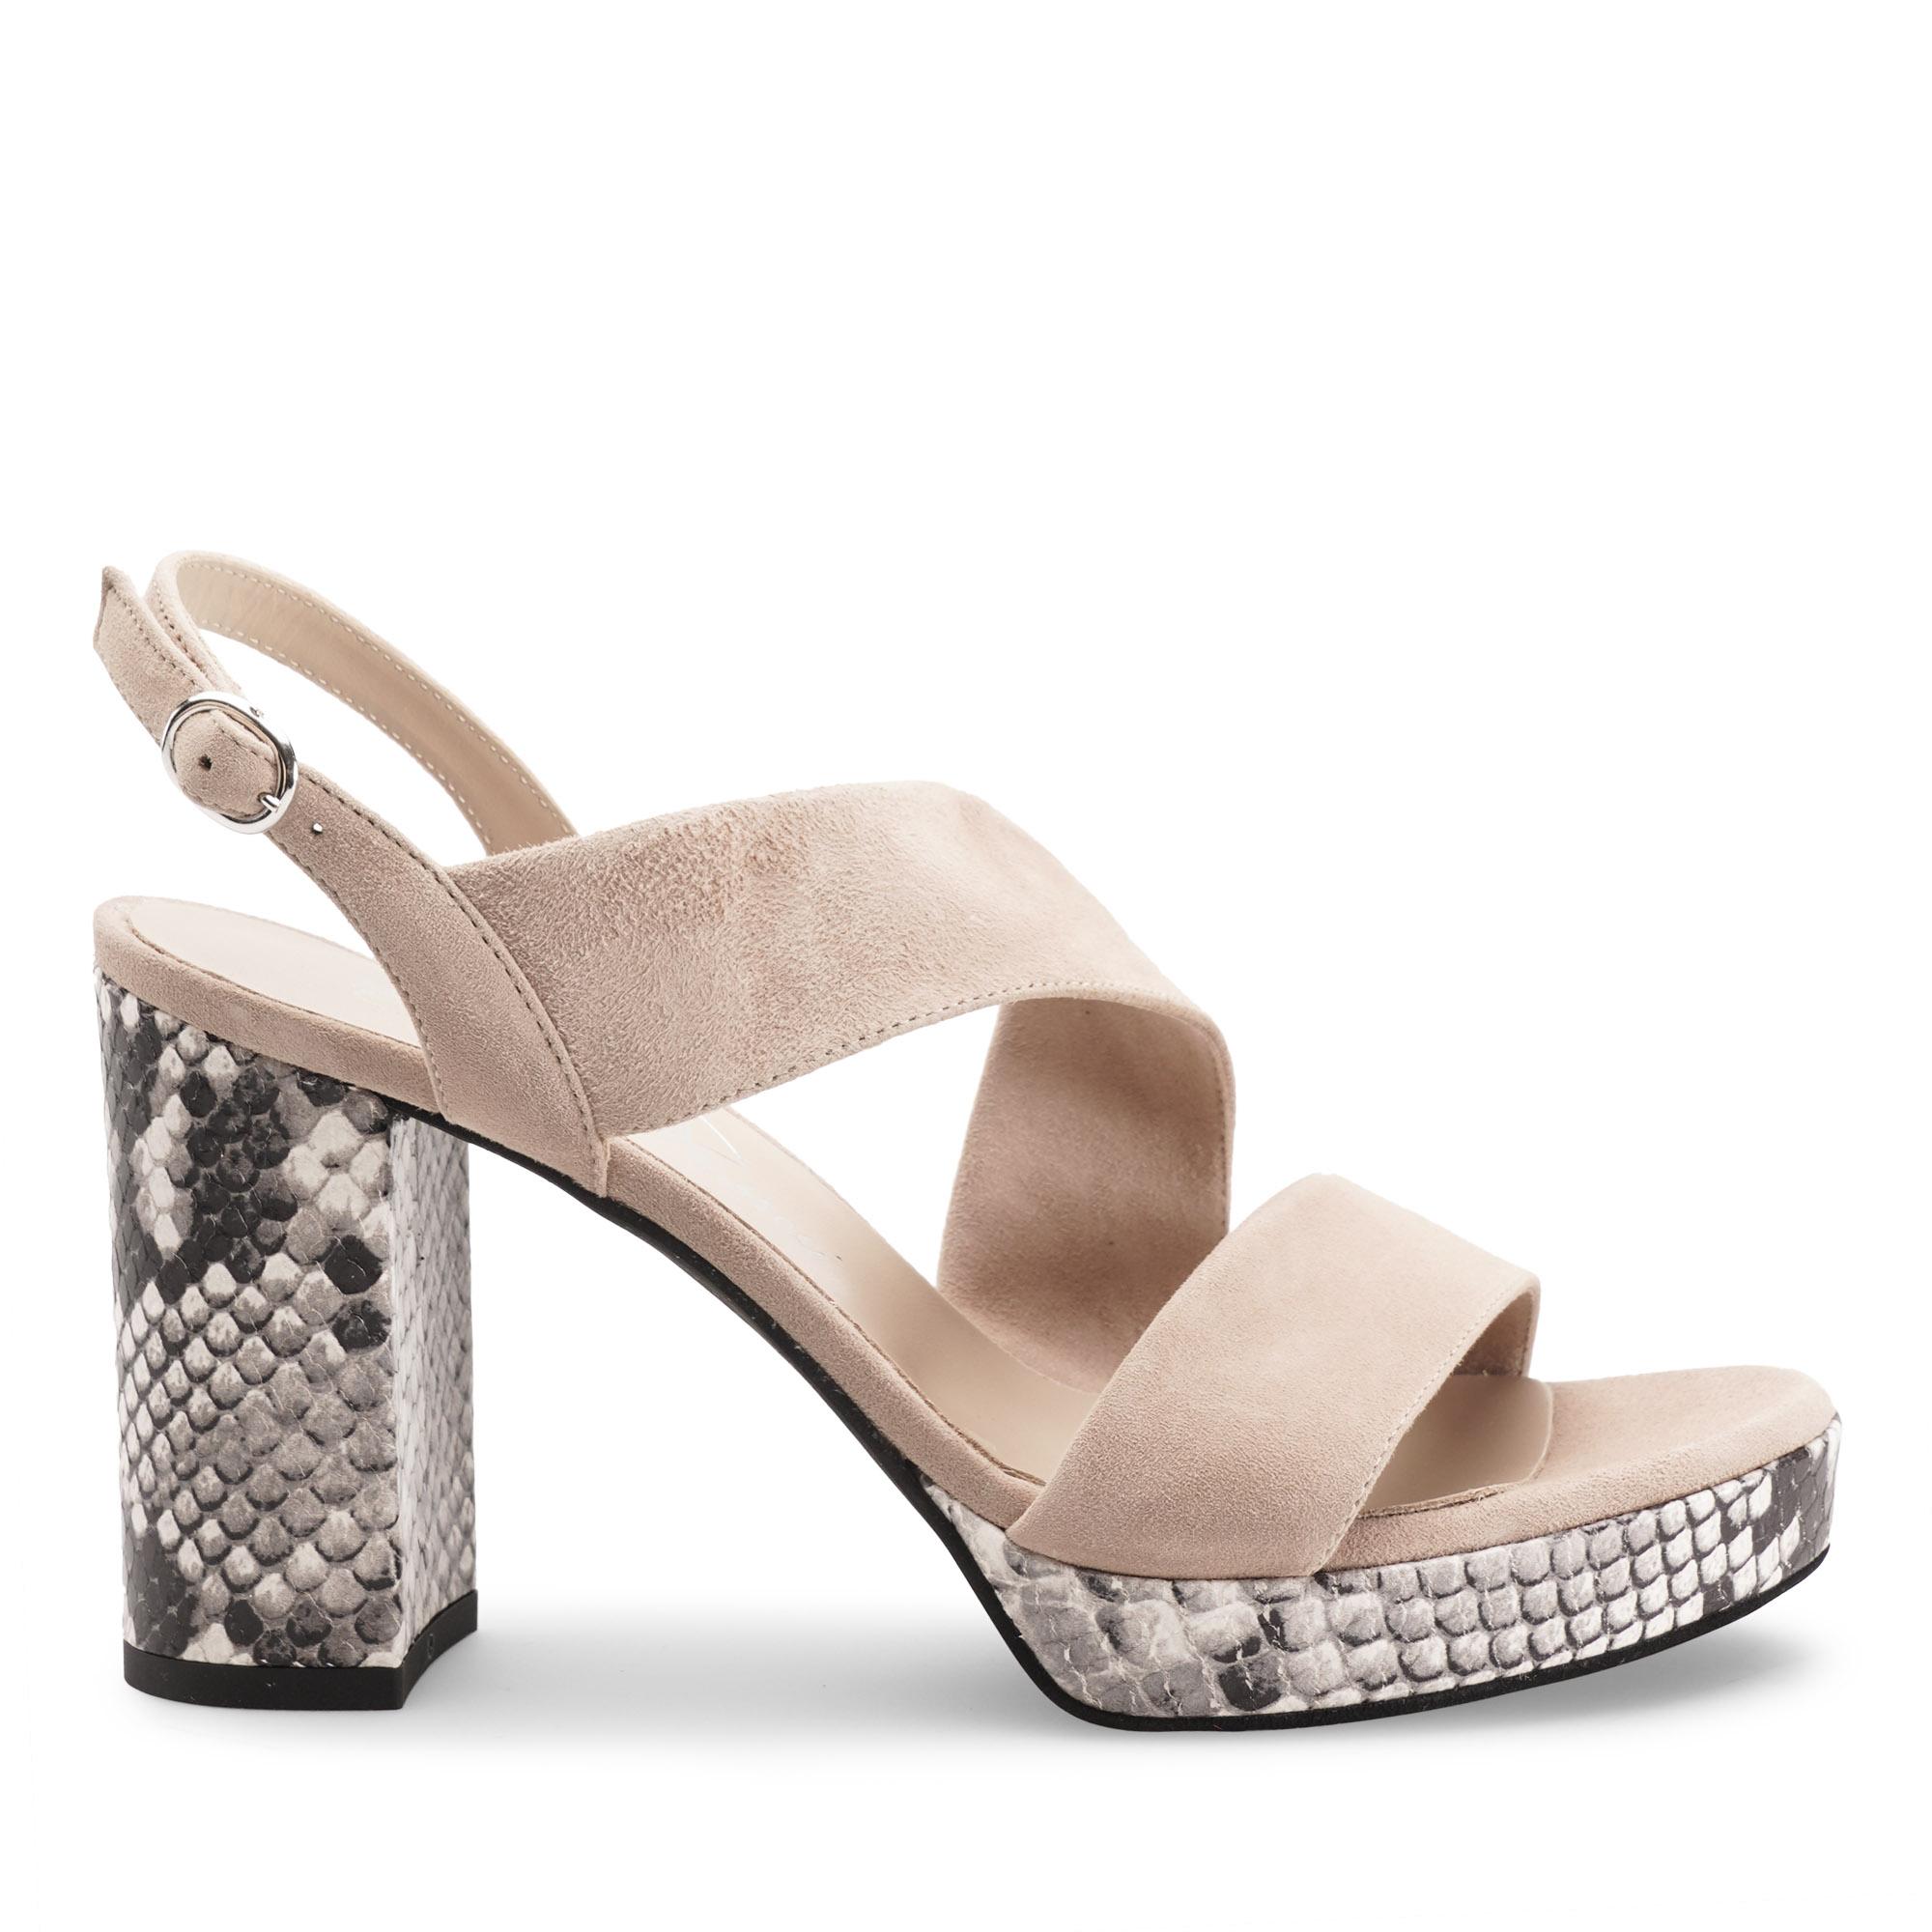 sandalo-pitone-camoscio-beige-emanuela-passeri-shoes-heels-spring-summer-2021